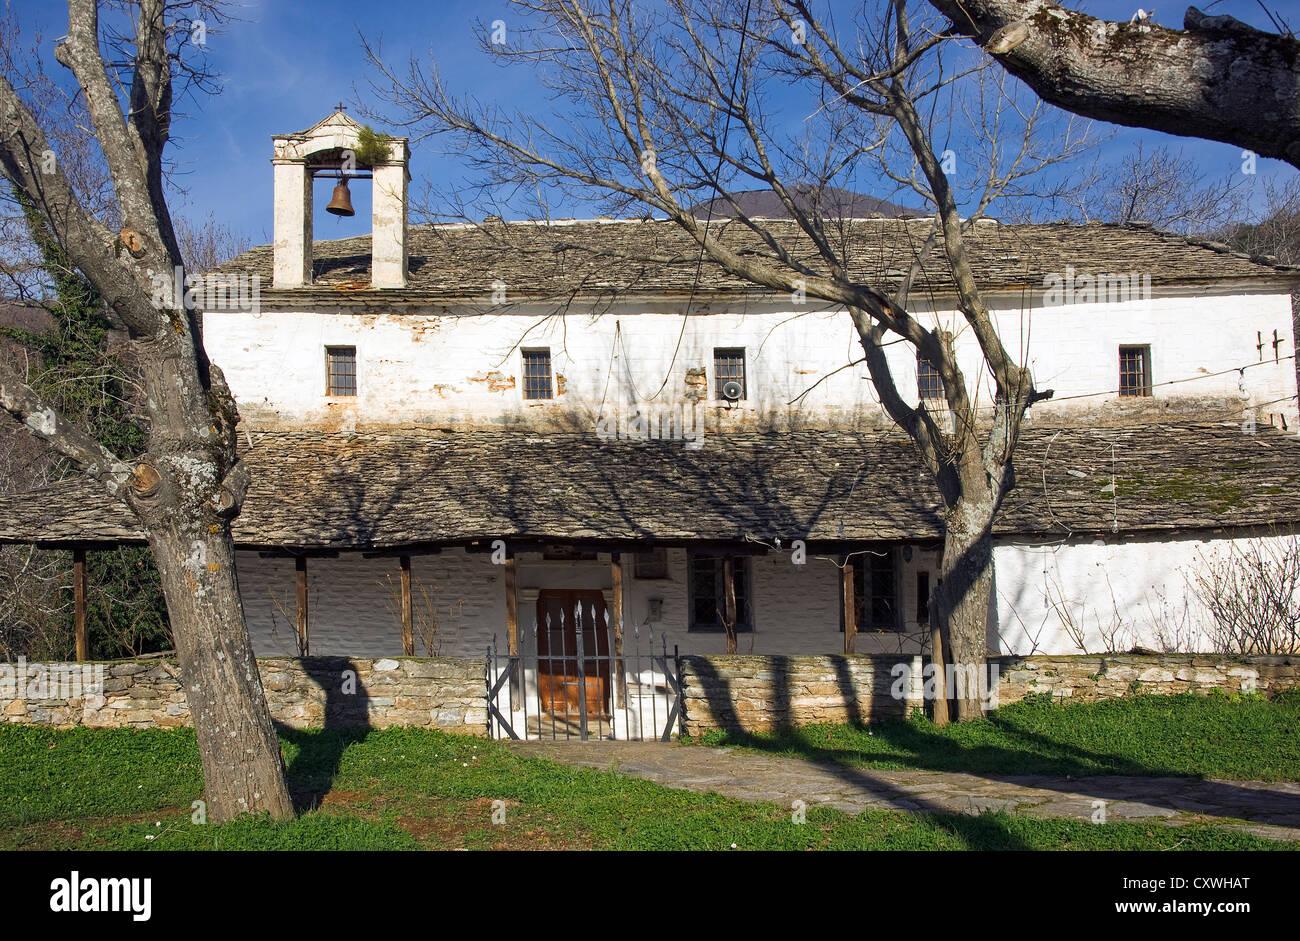 Old church near Agios Georgios (Pelion Peninsula, Thessaly, Greece) - Stock Image